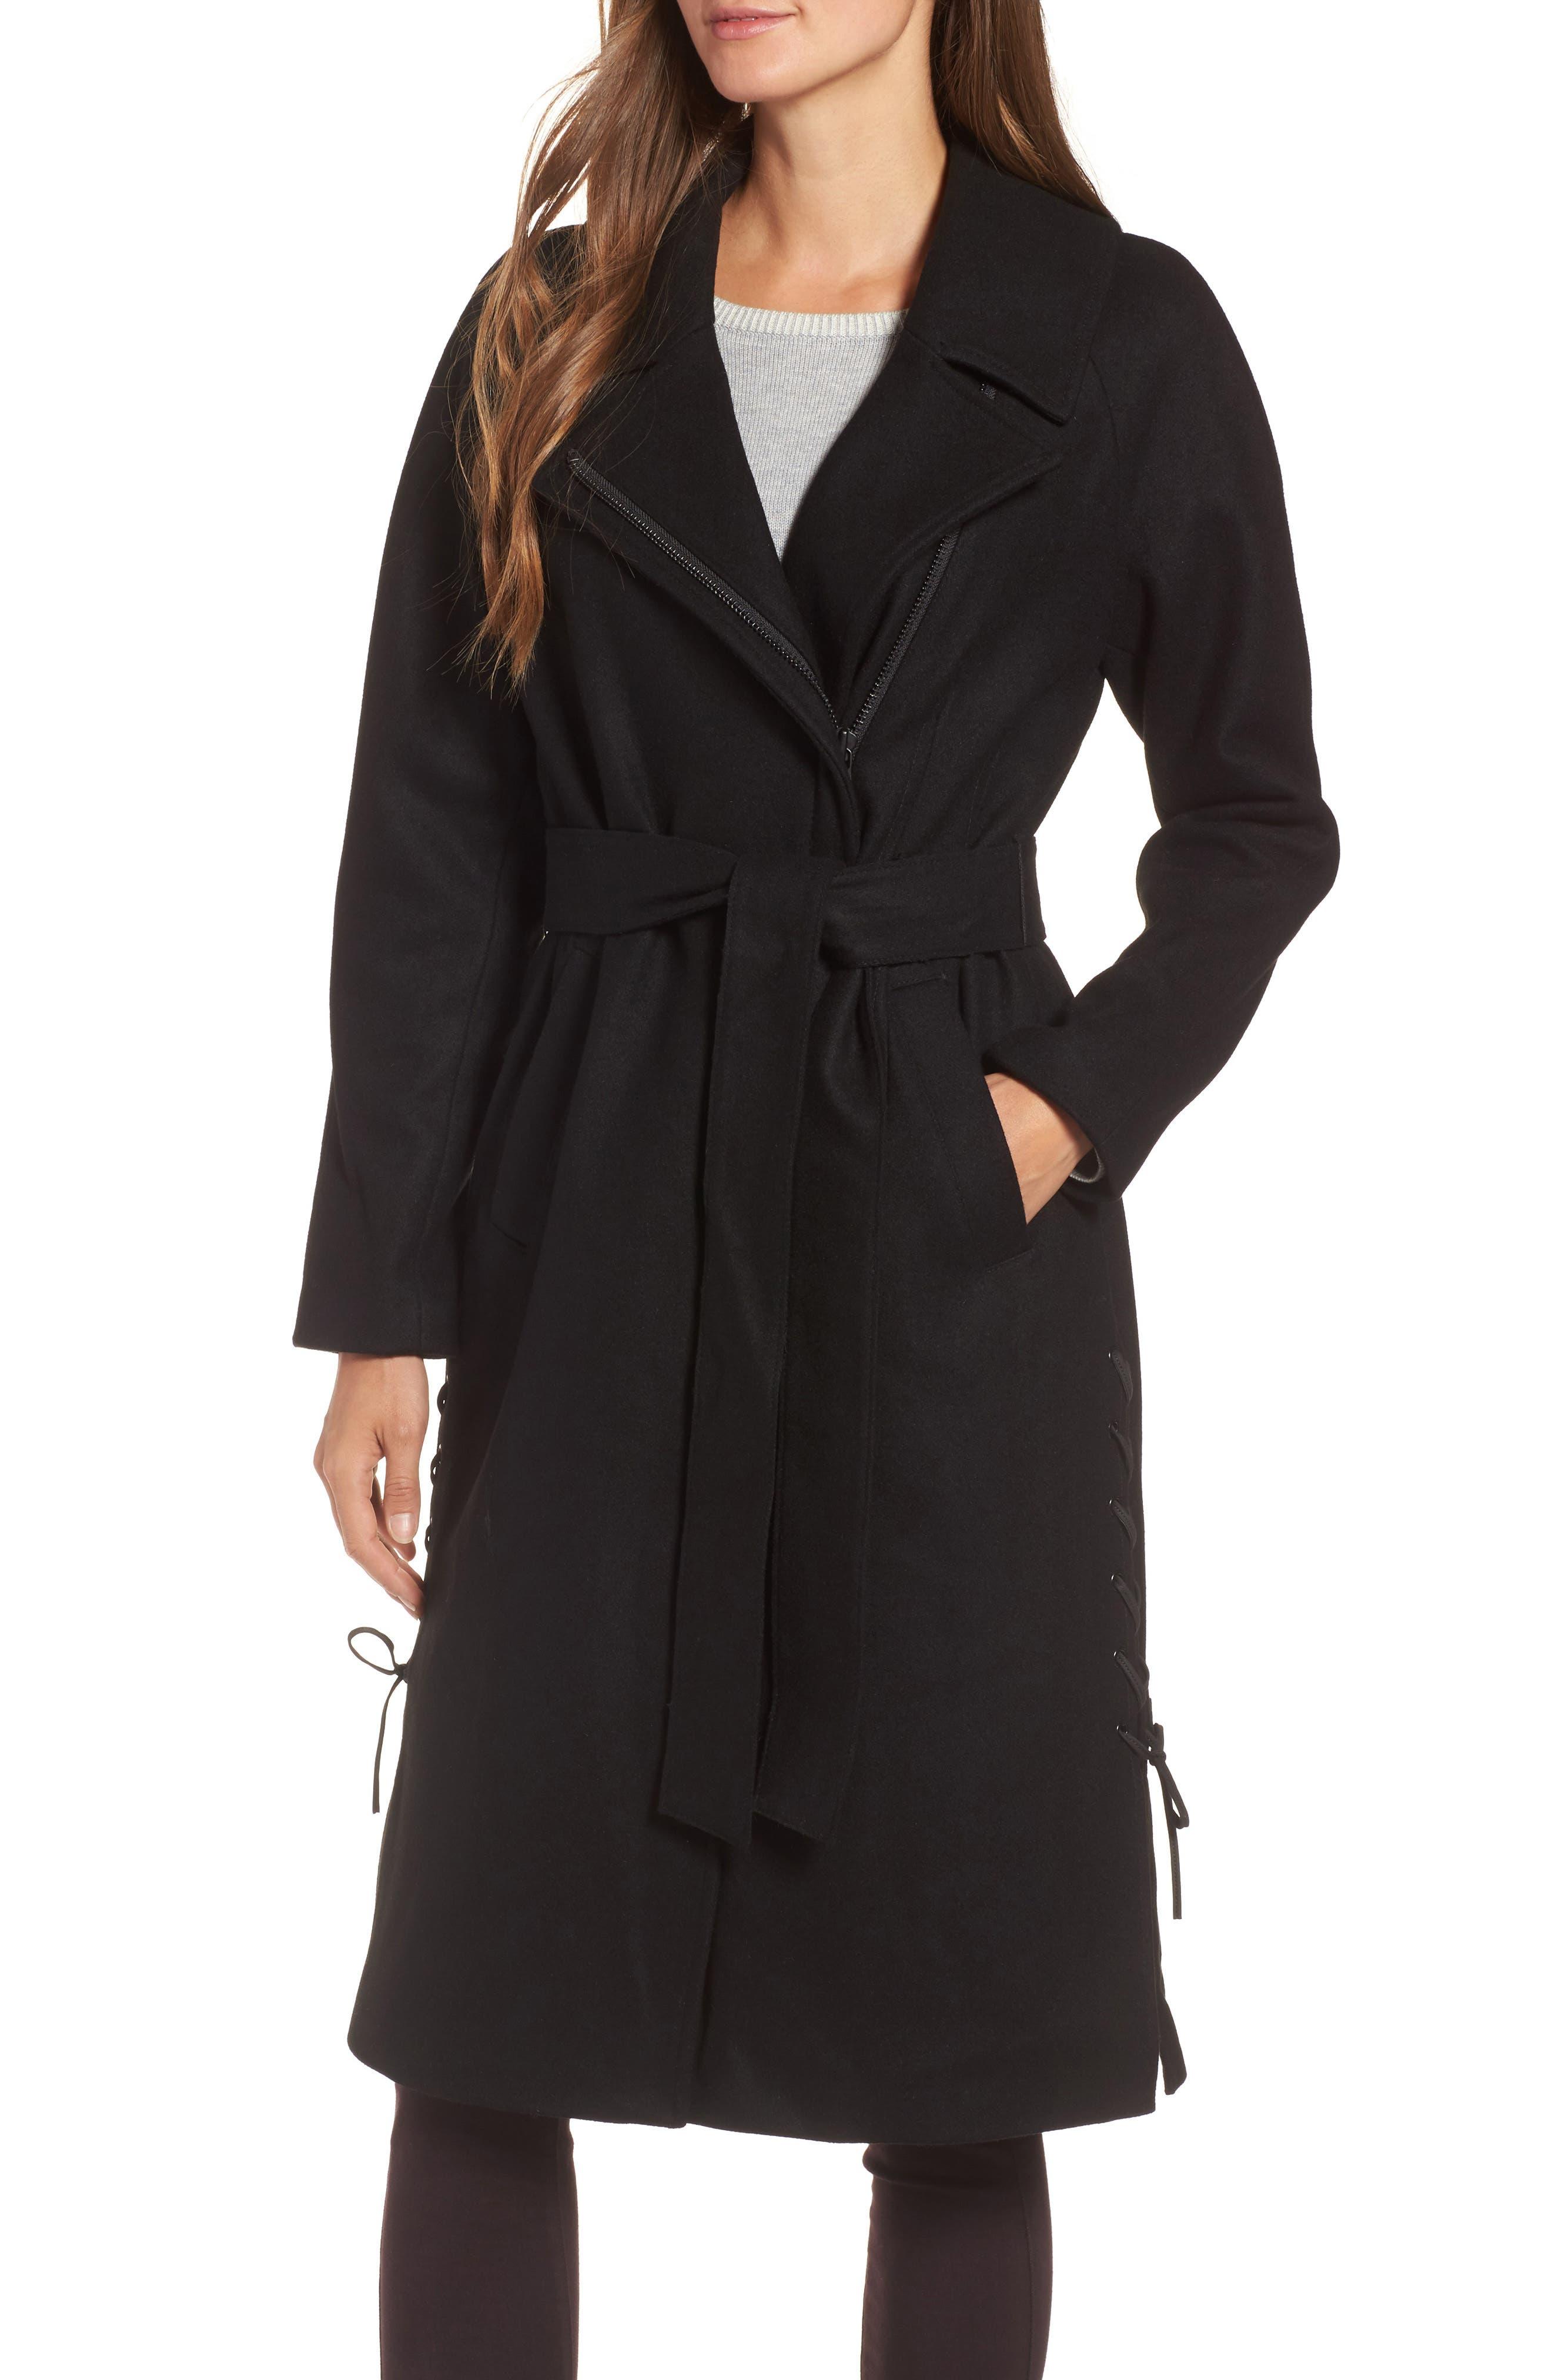 Baylee Asymmetrical Wool Blend Coat,                             Main thumbnail 1, color,                             001